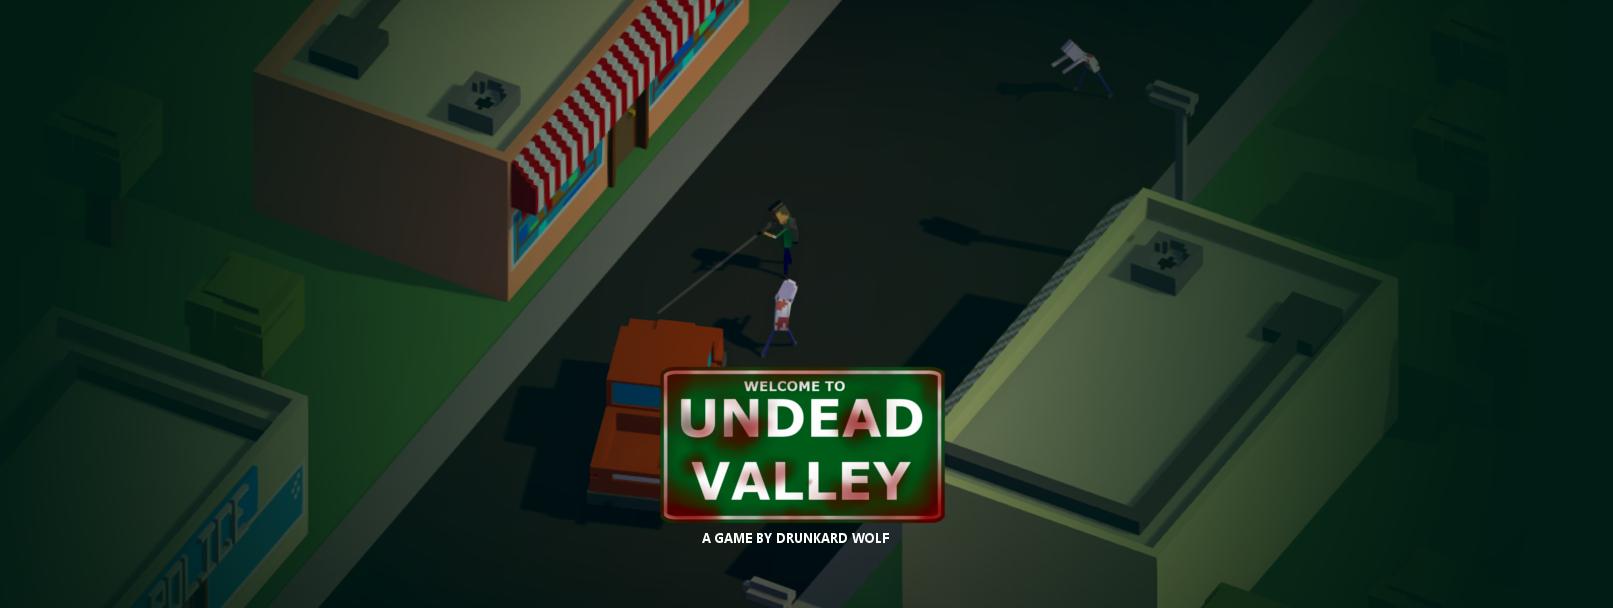 Undead Valley v0.0.5 Pre-Alpha